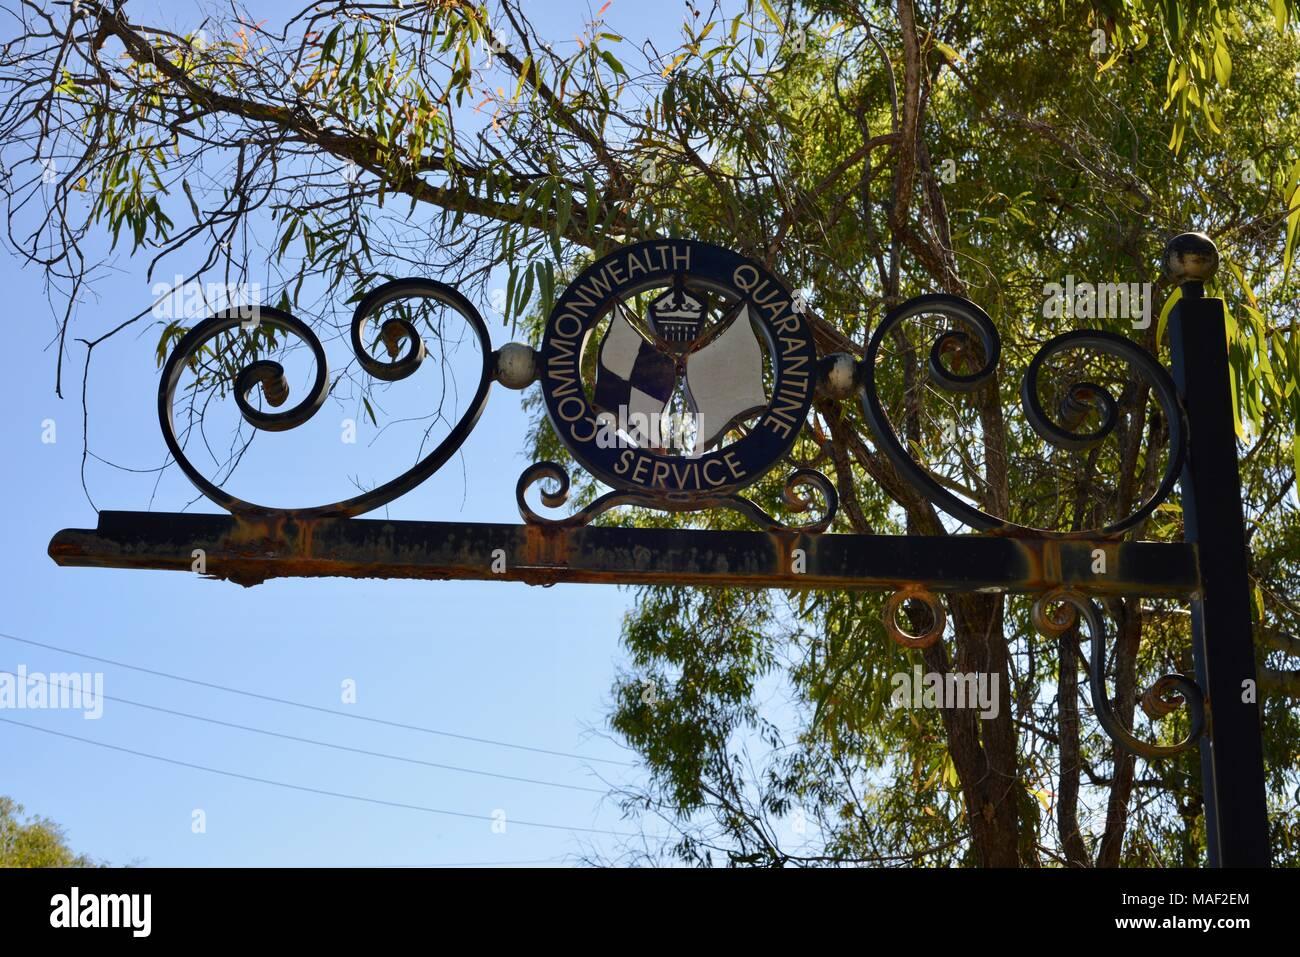 Commonwealth quarantine service sign, Shelly Cove trail at Cape Pallarenda Conservation Park Queensland Australia - Stock Image